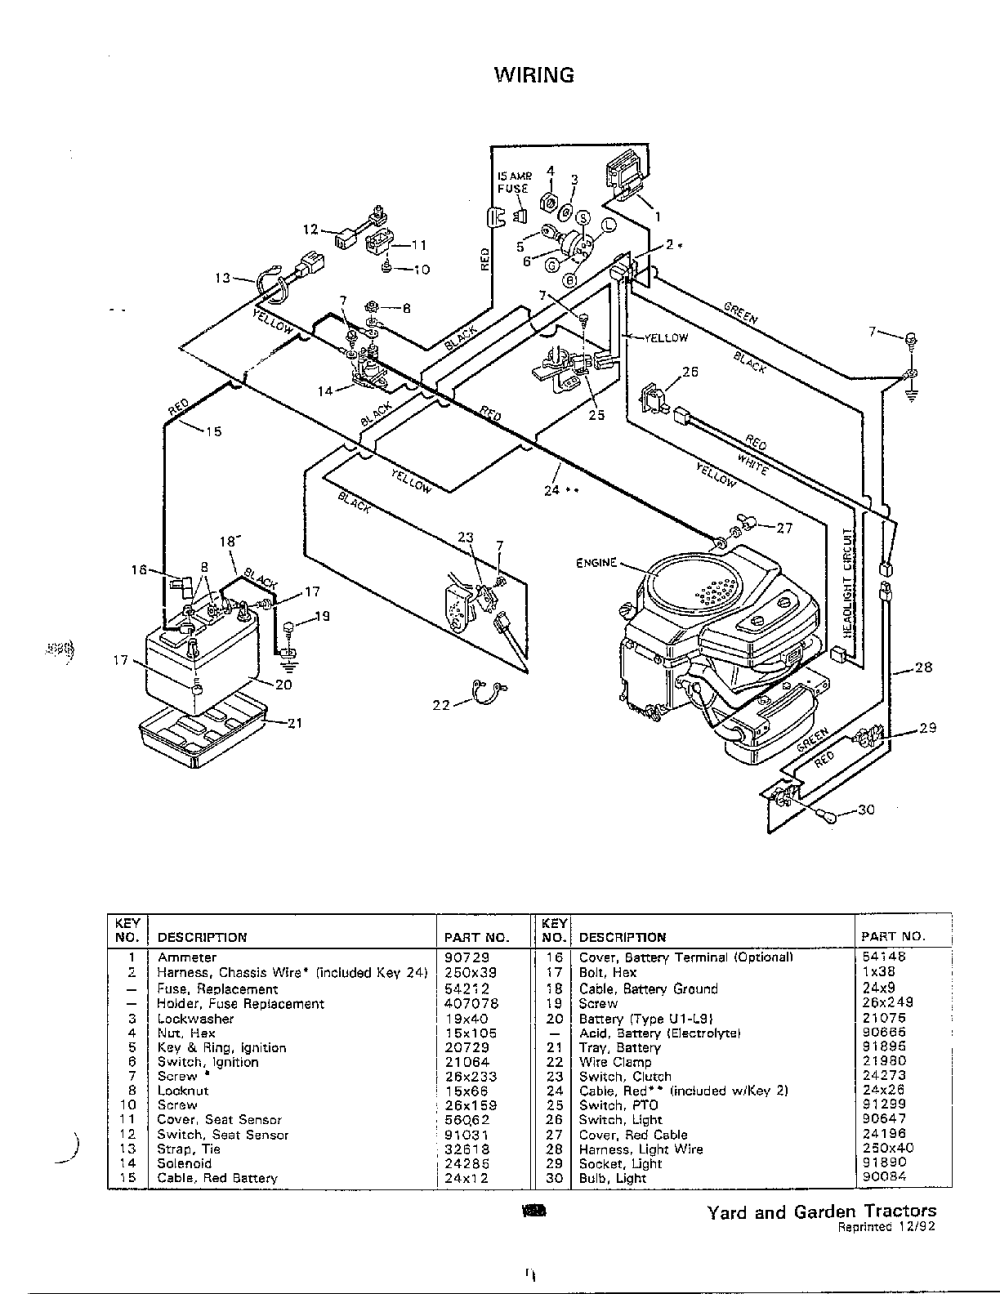 medium resolution of  murray wiring diagram 8hp wiring diagram database edko columbus ohio murray wiring diagram riding mower rc